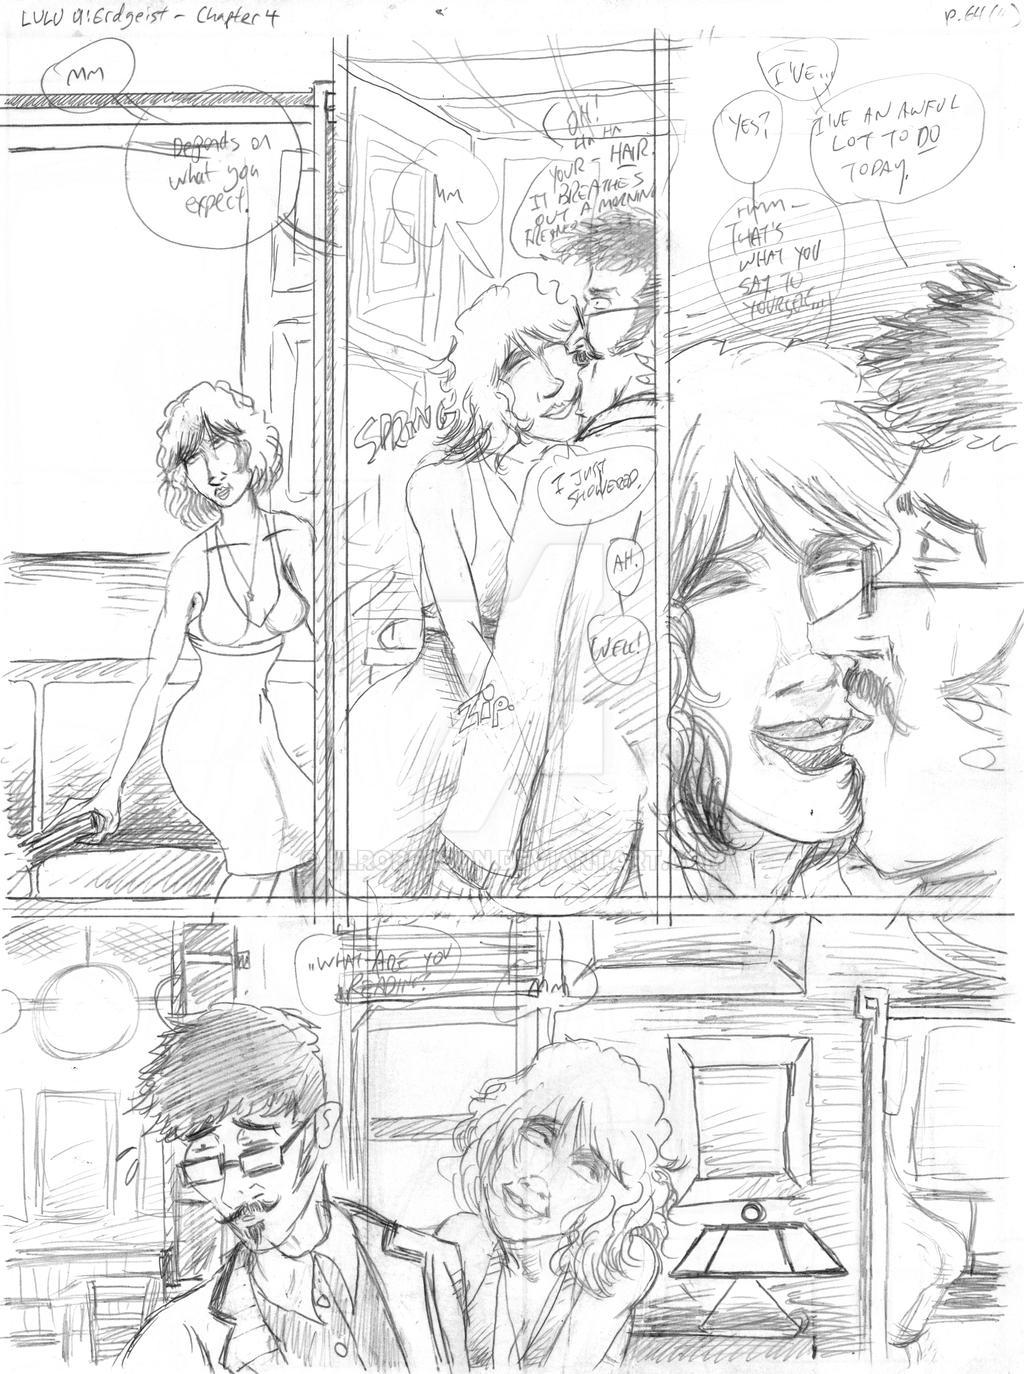 LULU Book 2 - Chapter 4 p. 64 Pencil